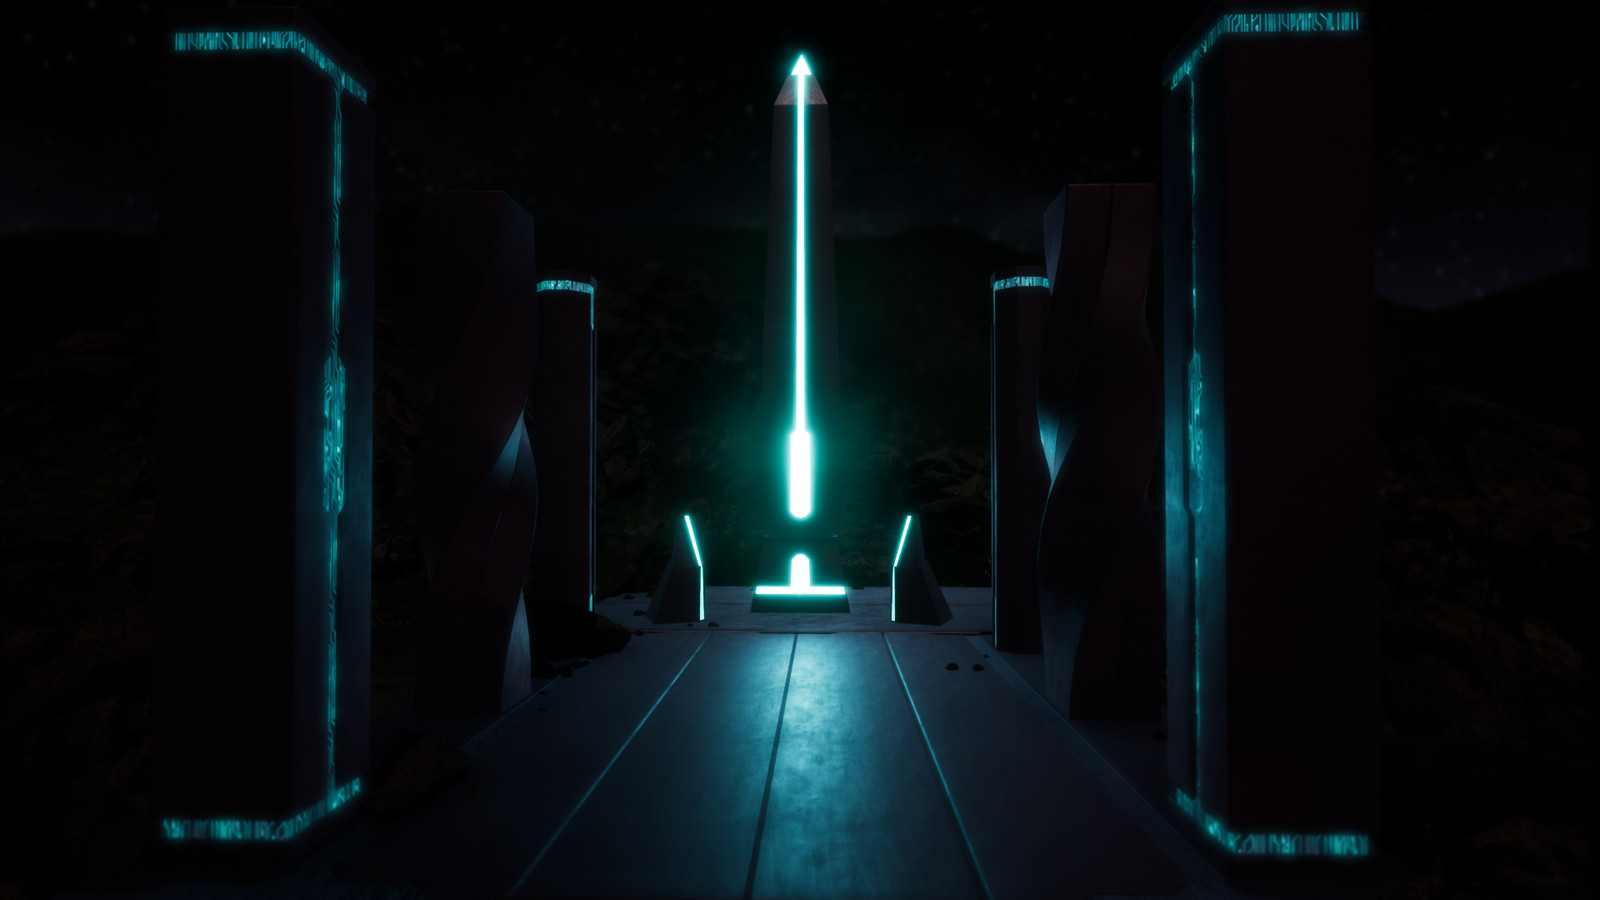 A little scifi lighting fun